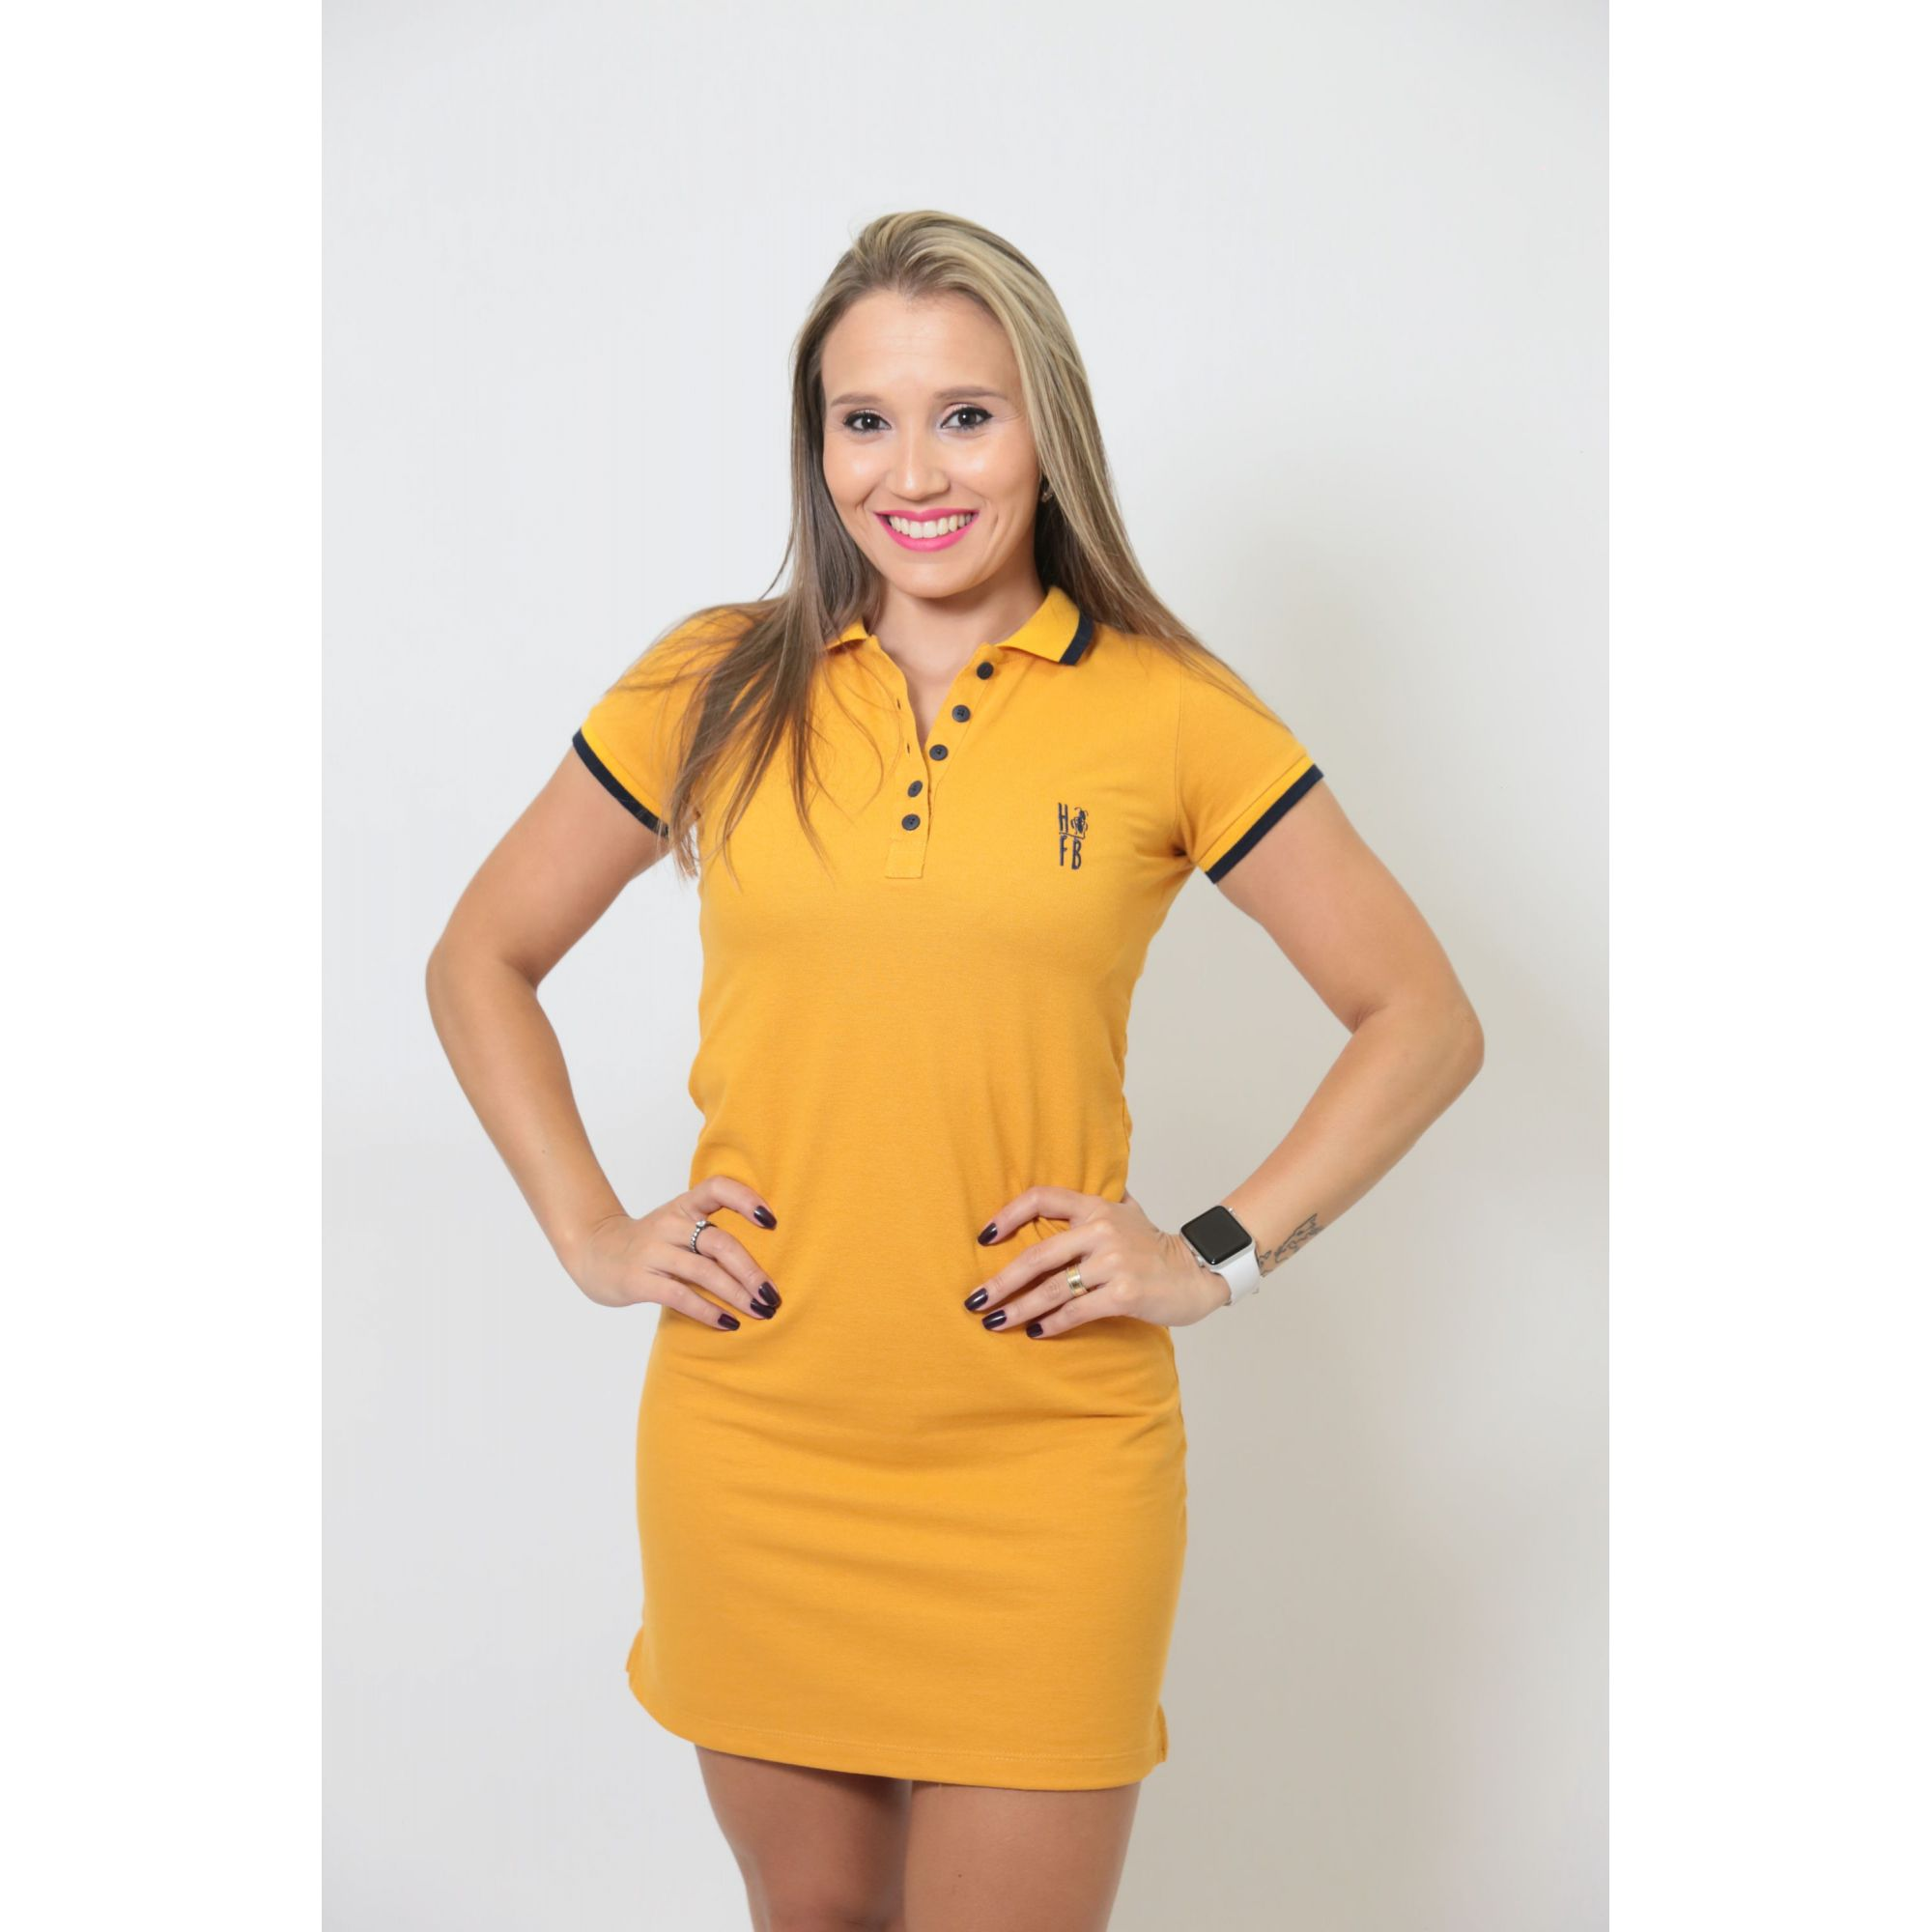 MÃE E FILHO > Kit 02 peças Vestido + Body Unissex Polo - Mostarda [Coleção Tal Mãe Tal Filho]  - Heitor Fashion Brazil